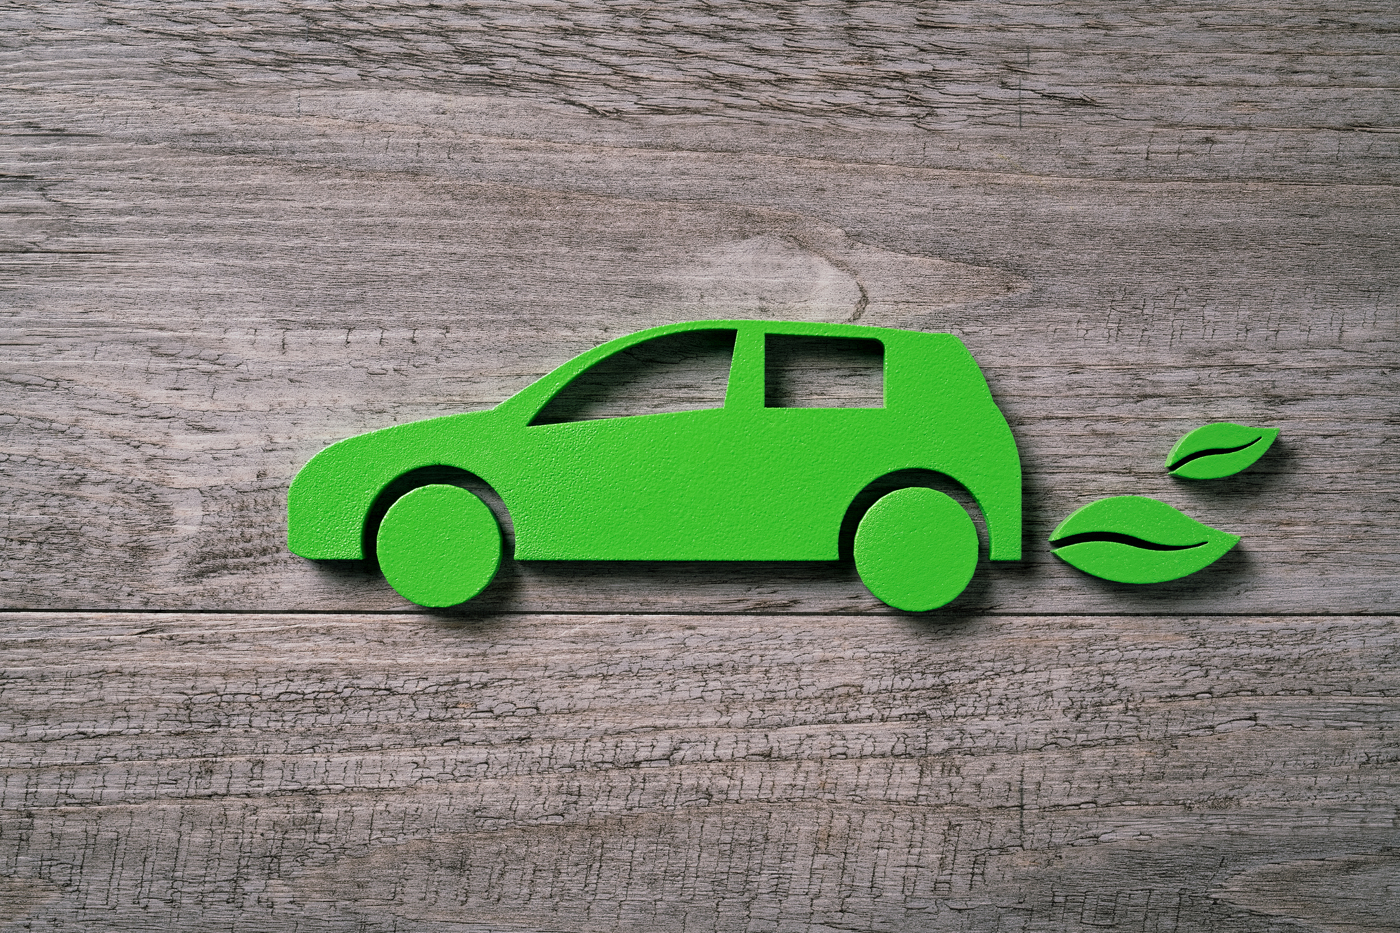 Electric Vehicle Stocks, EV stocks, Autonomous Vehicle stocks, AV stocks